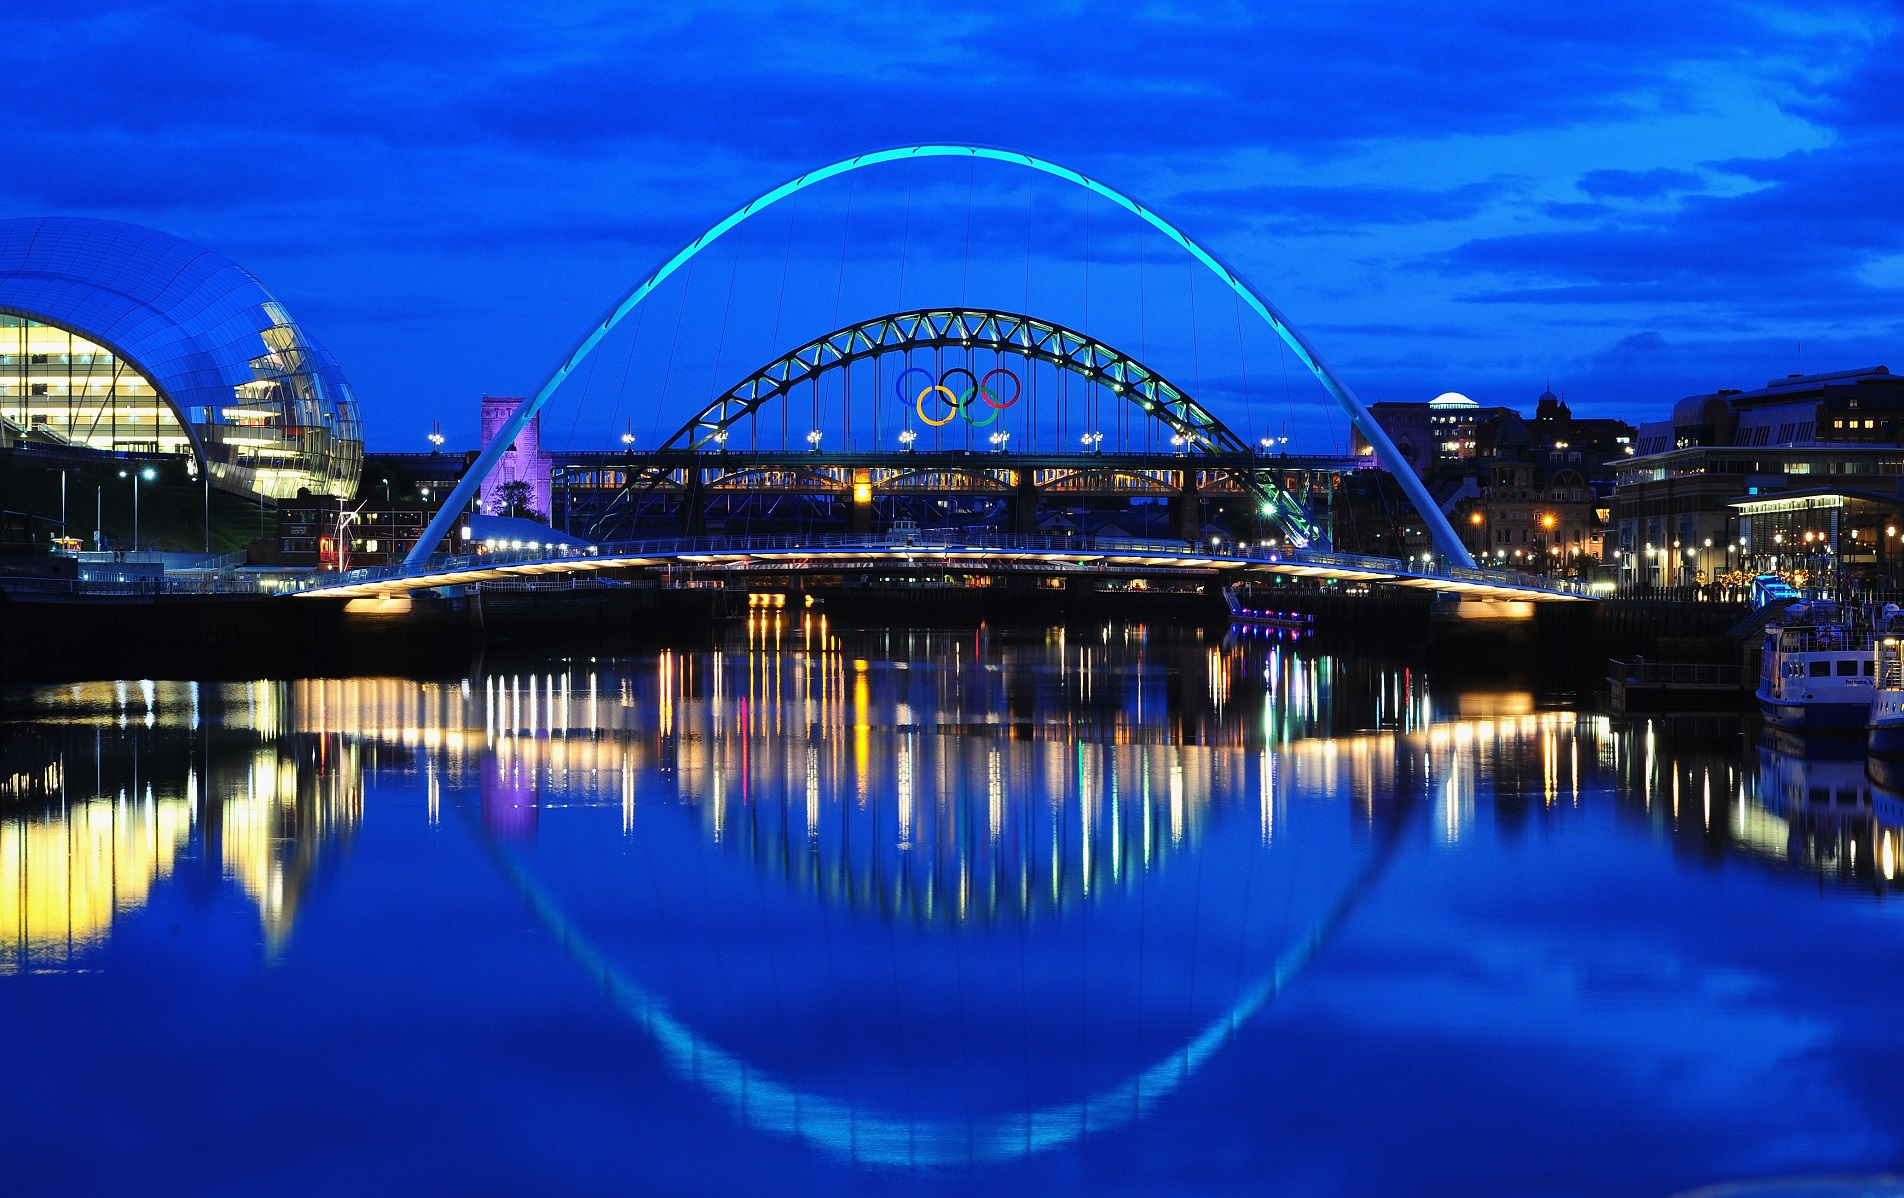 El Tyne Bridge de Newcastle